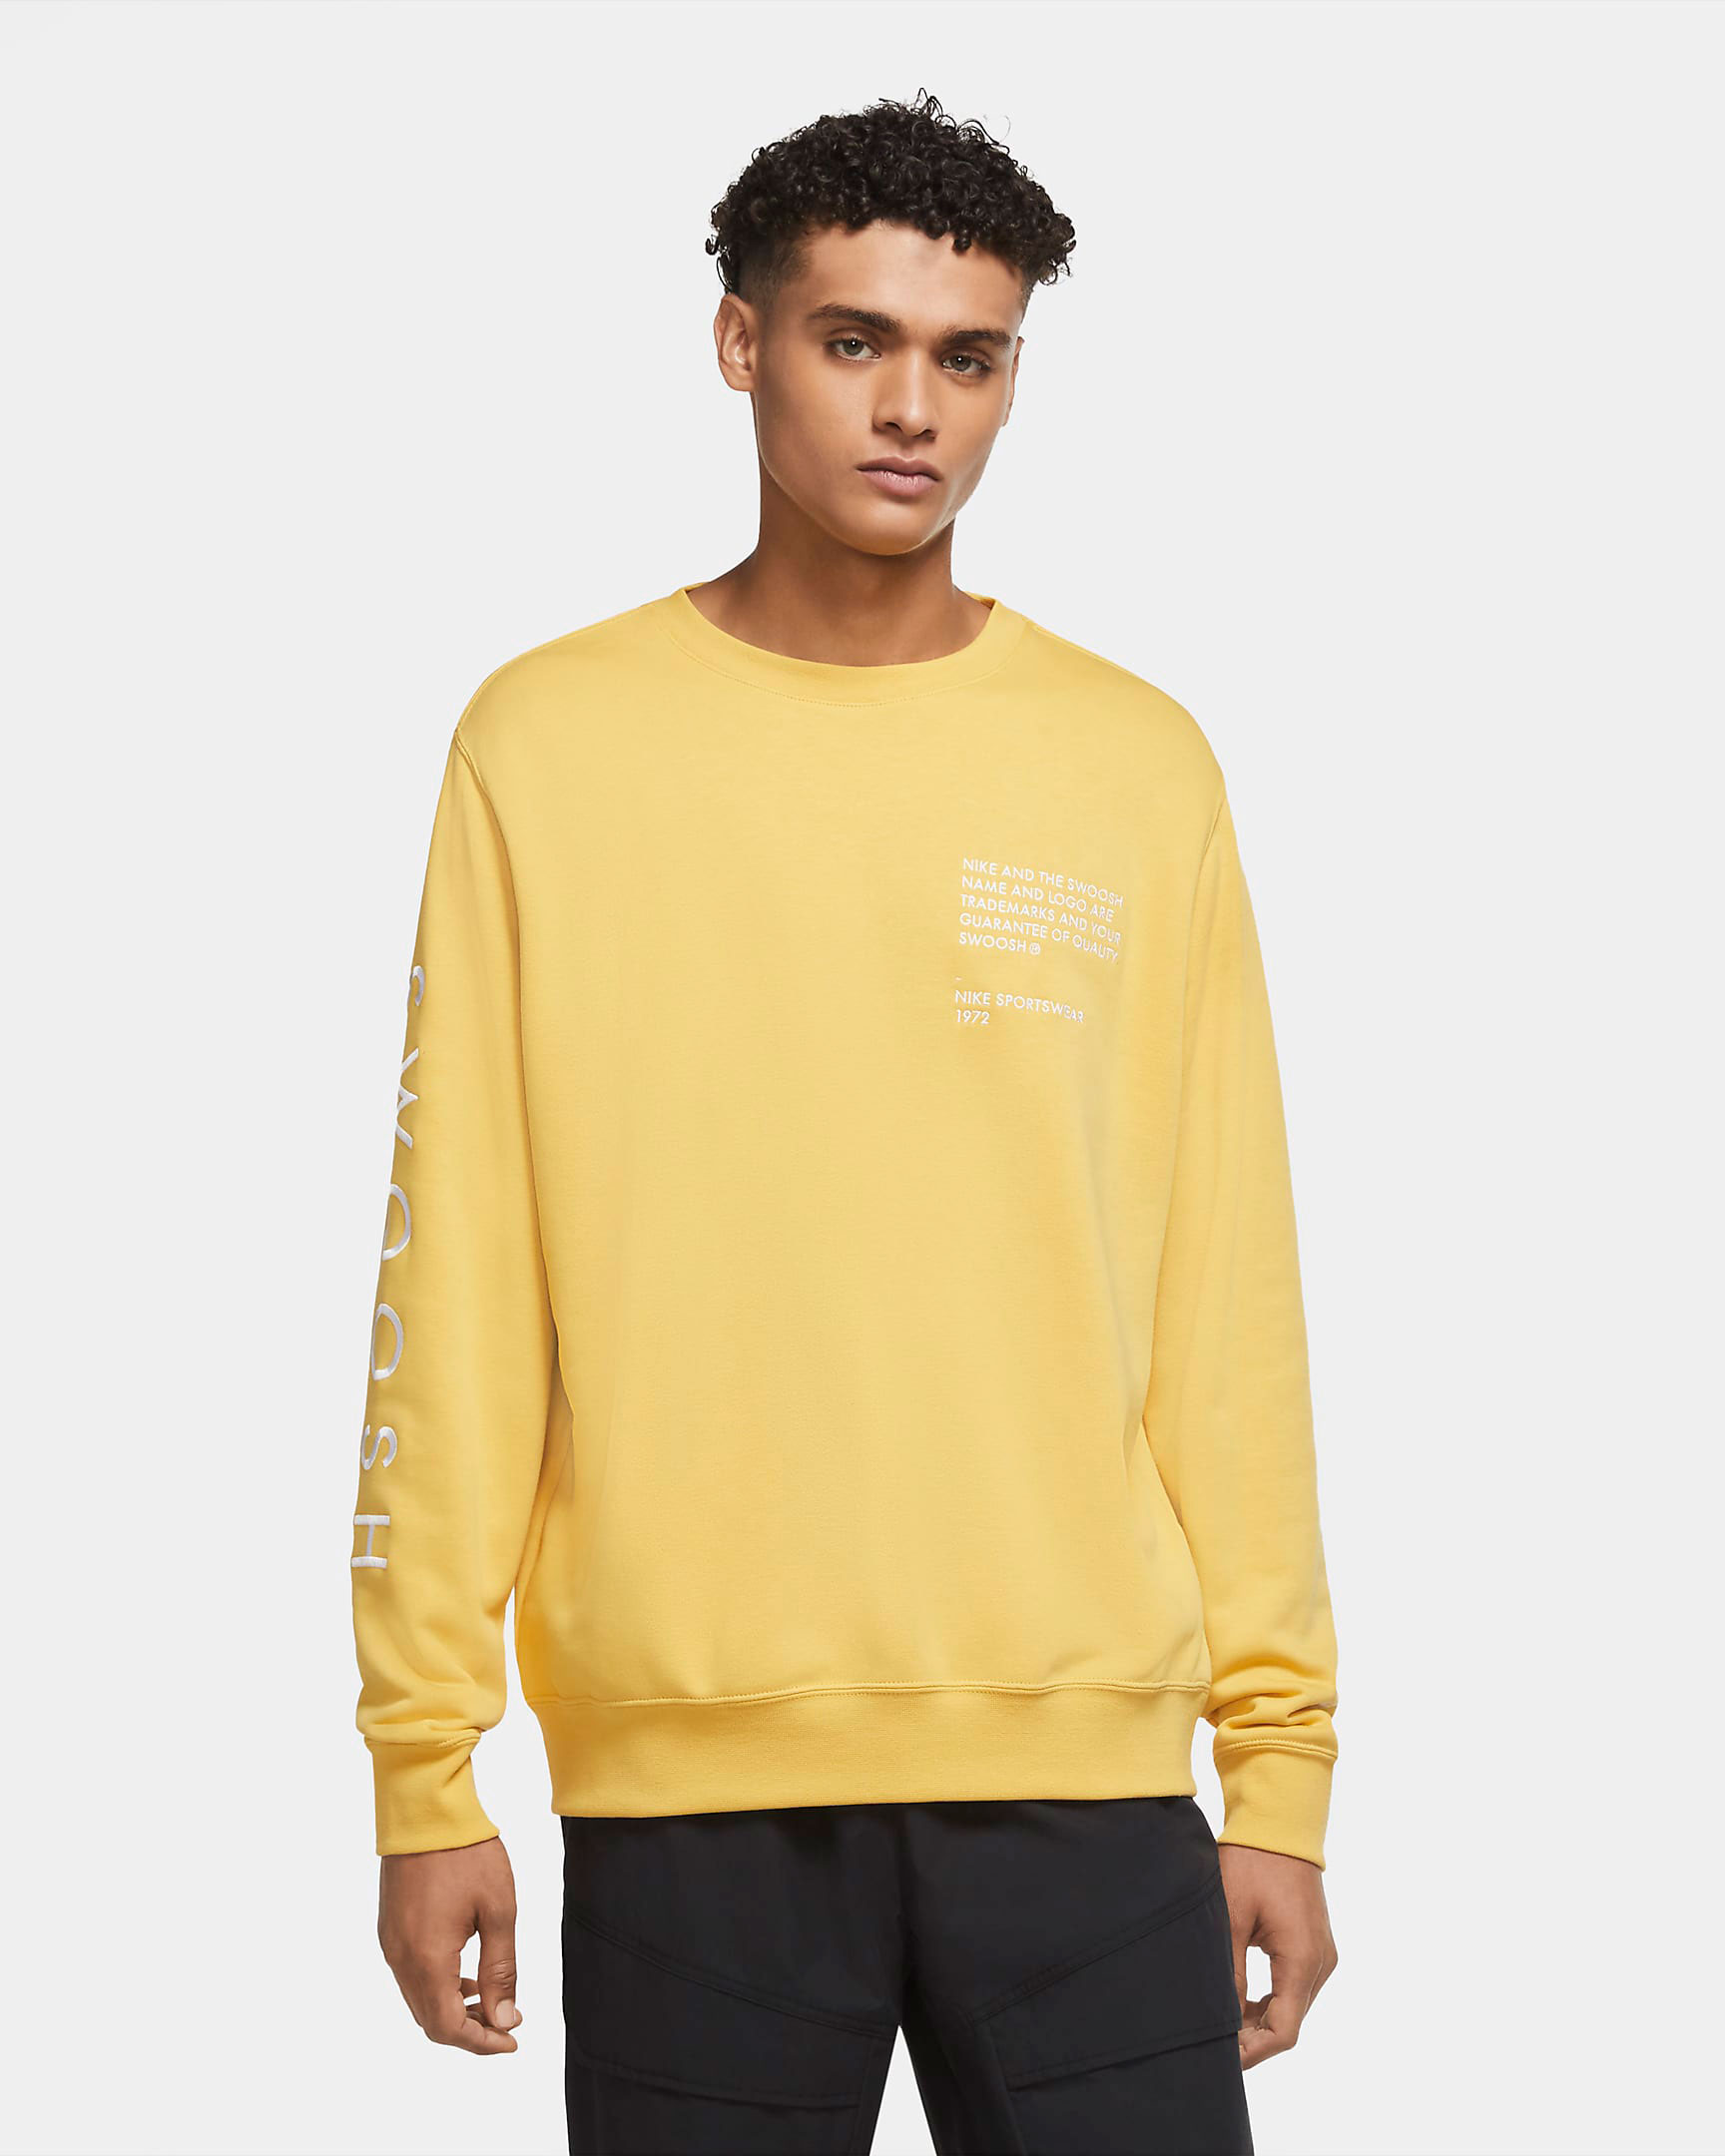 nike-air-max-1-lemonade-yellow-swoosh-sweatshirt